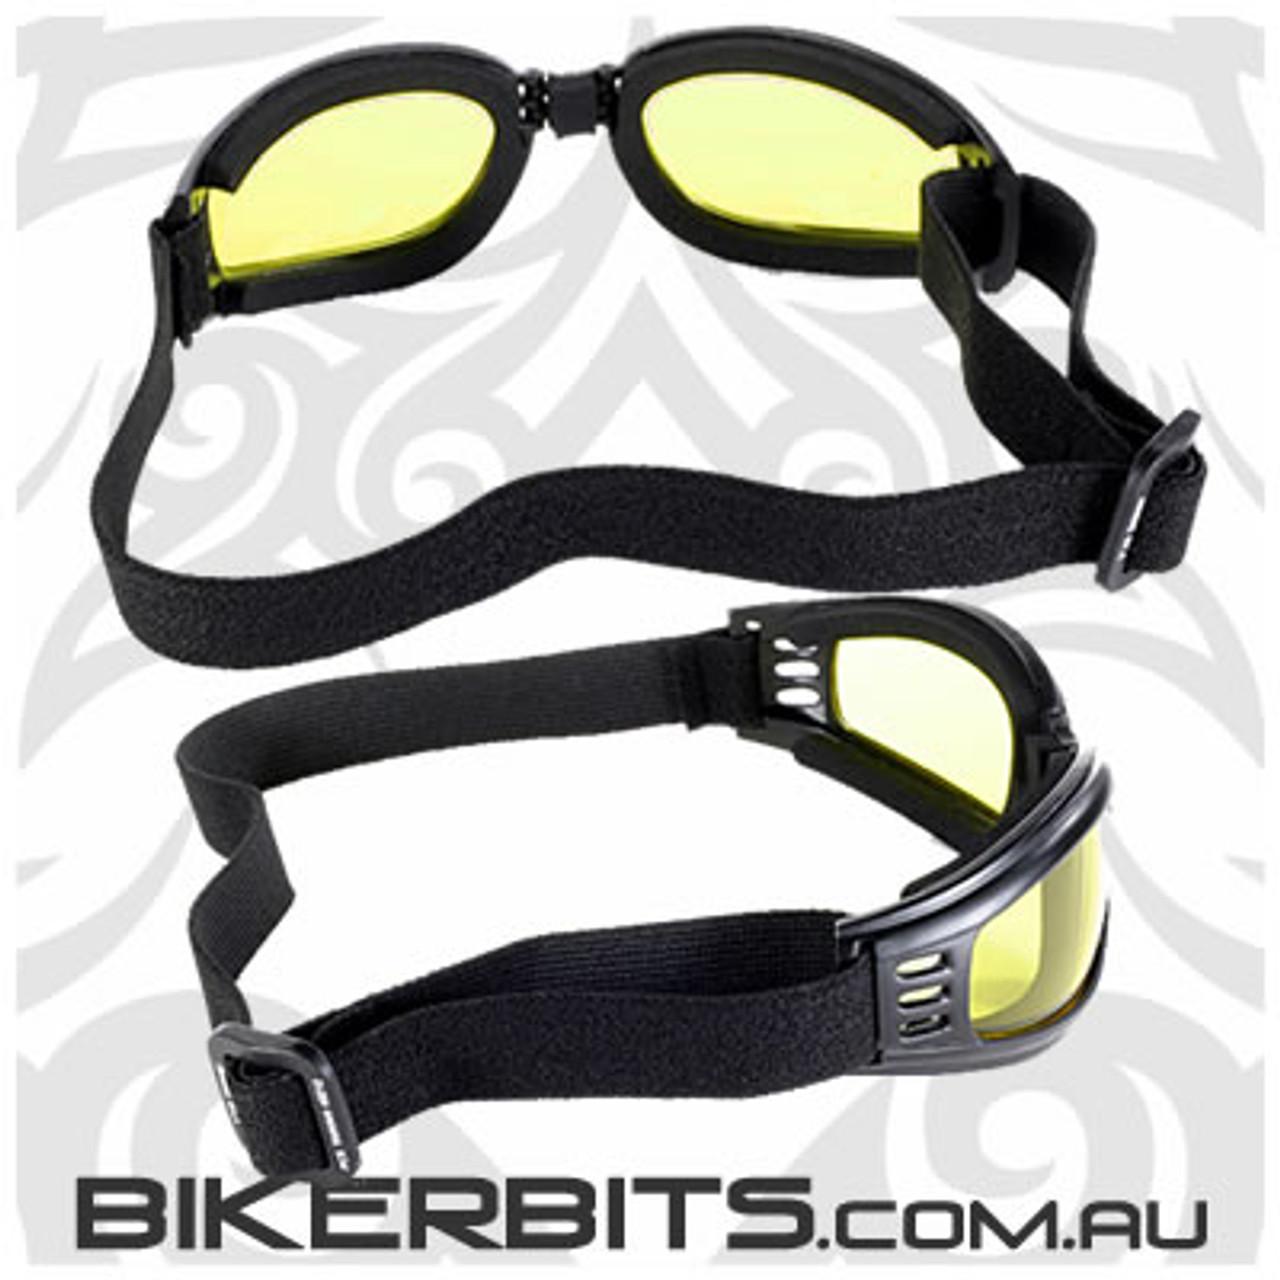 Motorcycle Goggles - Kickstart Nomad - Yellow/Black